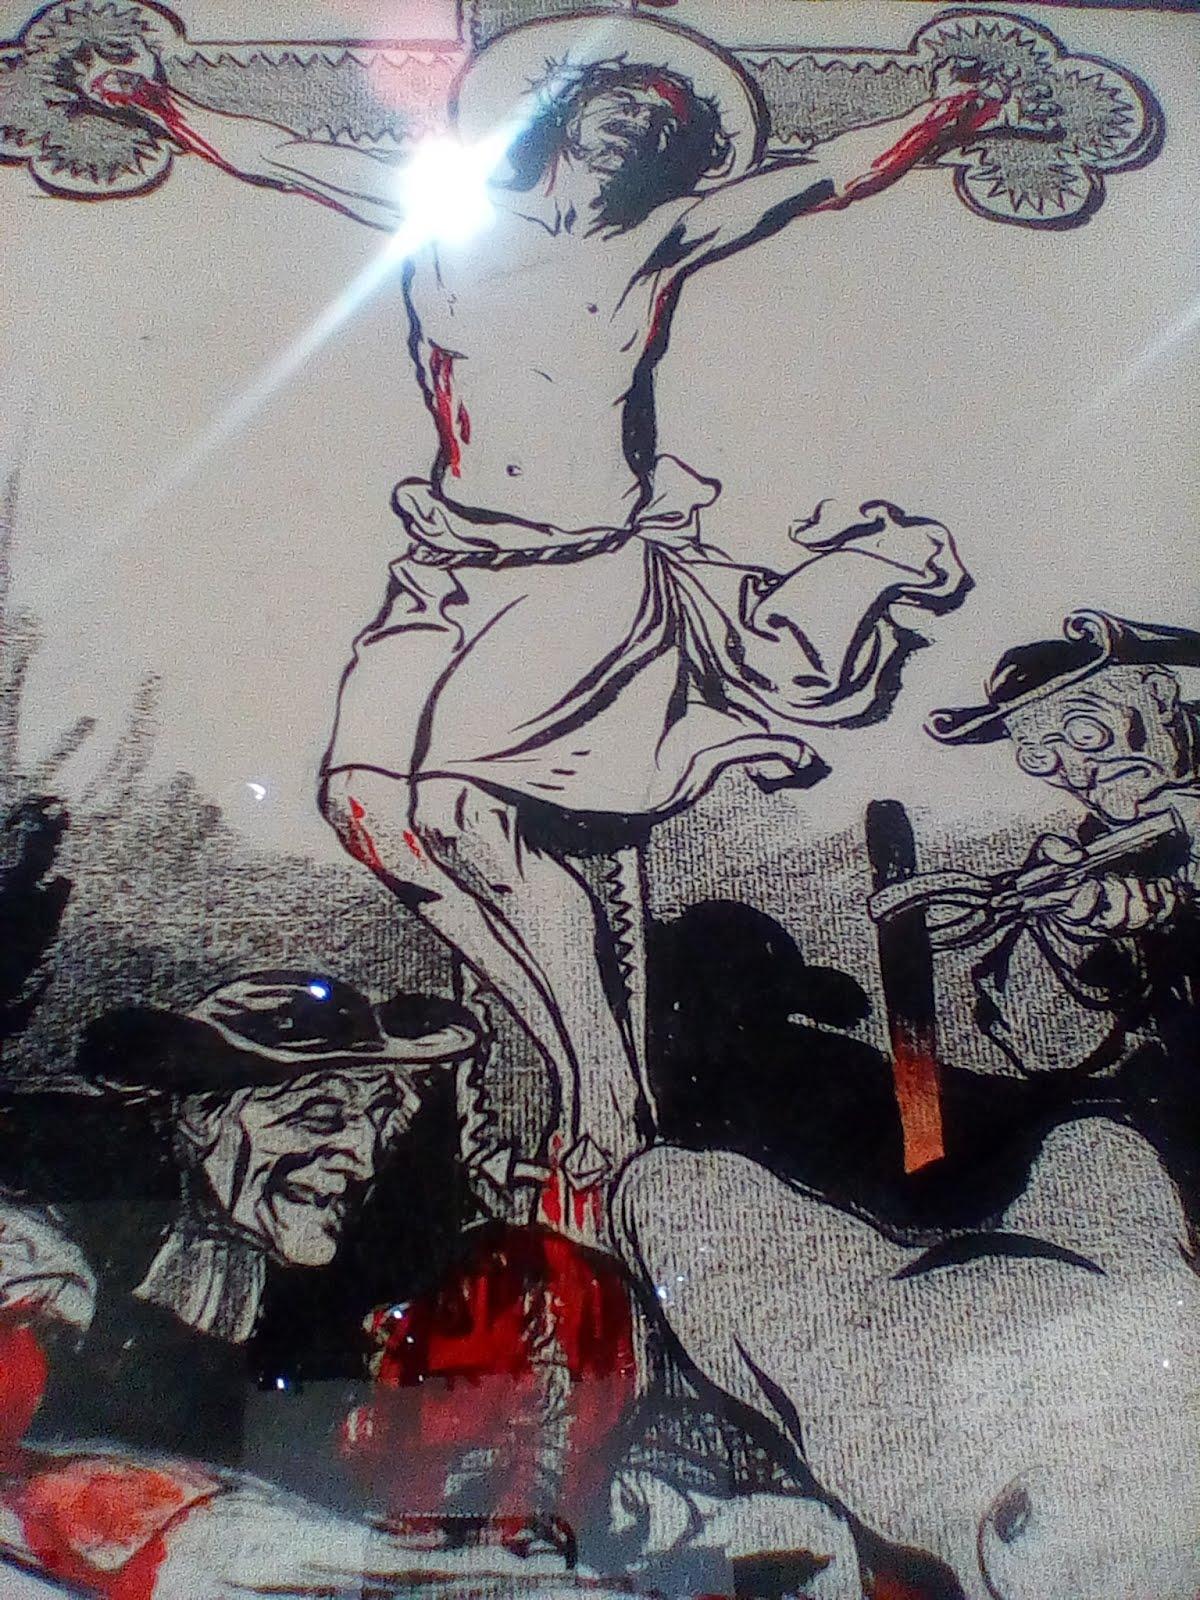 Kupka religional criminalities